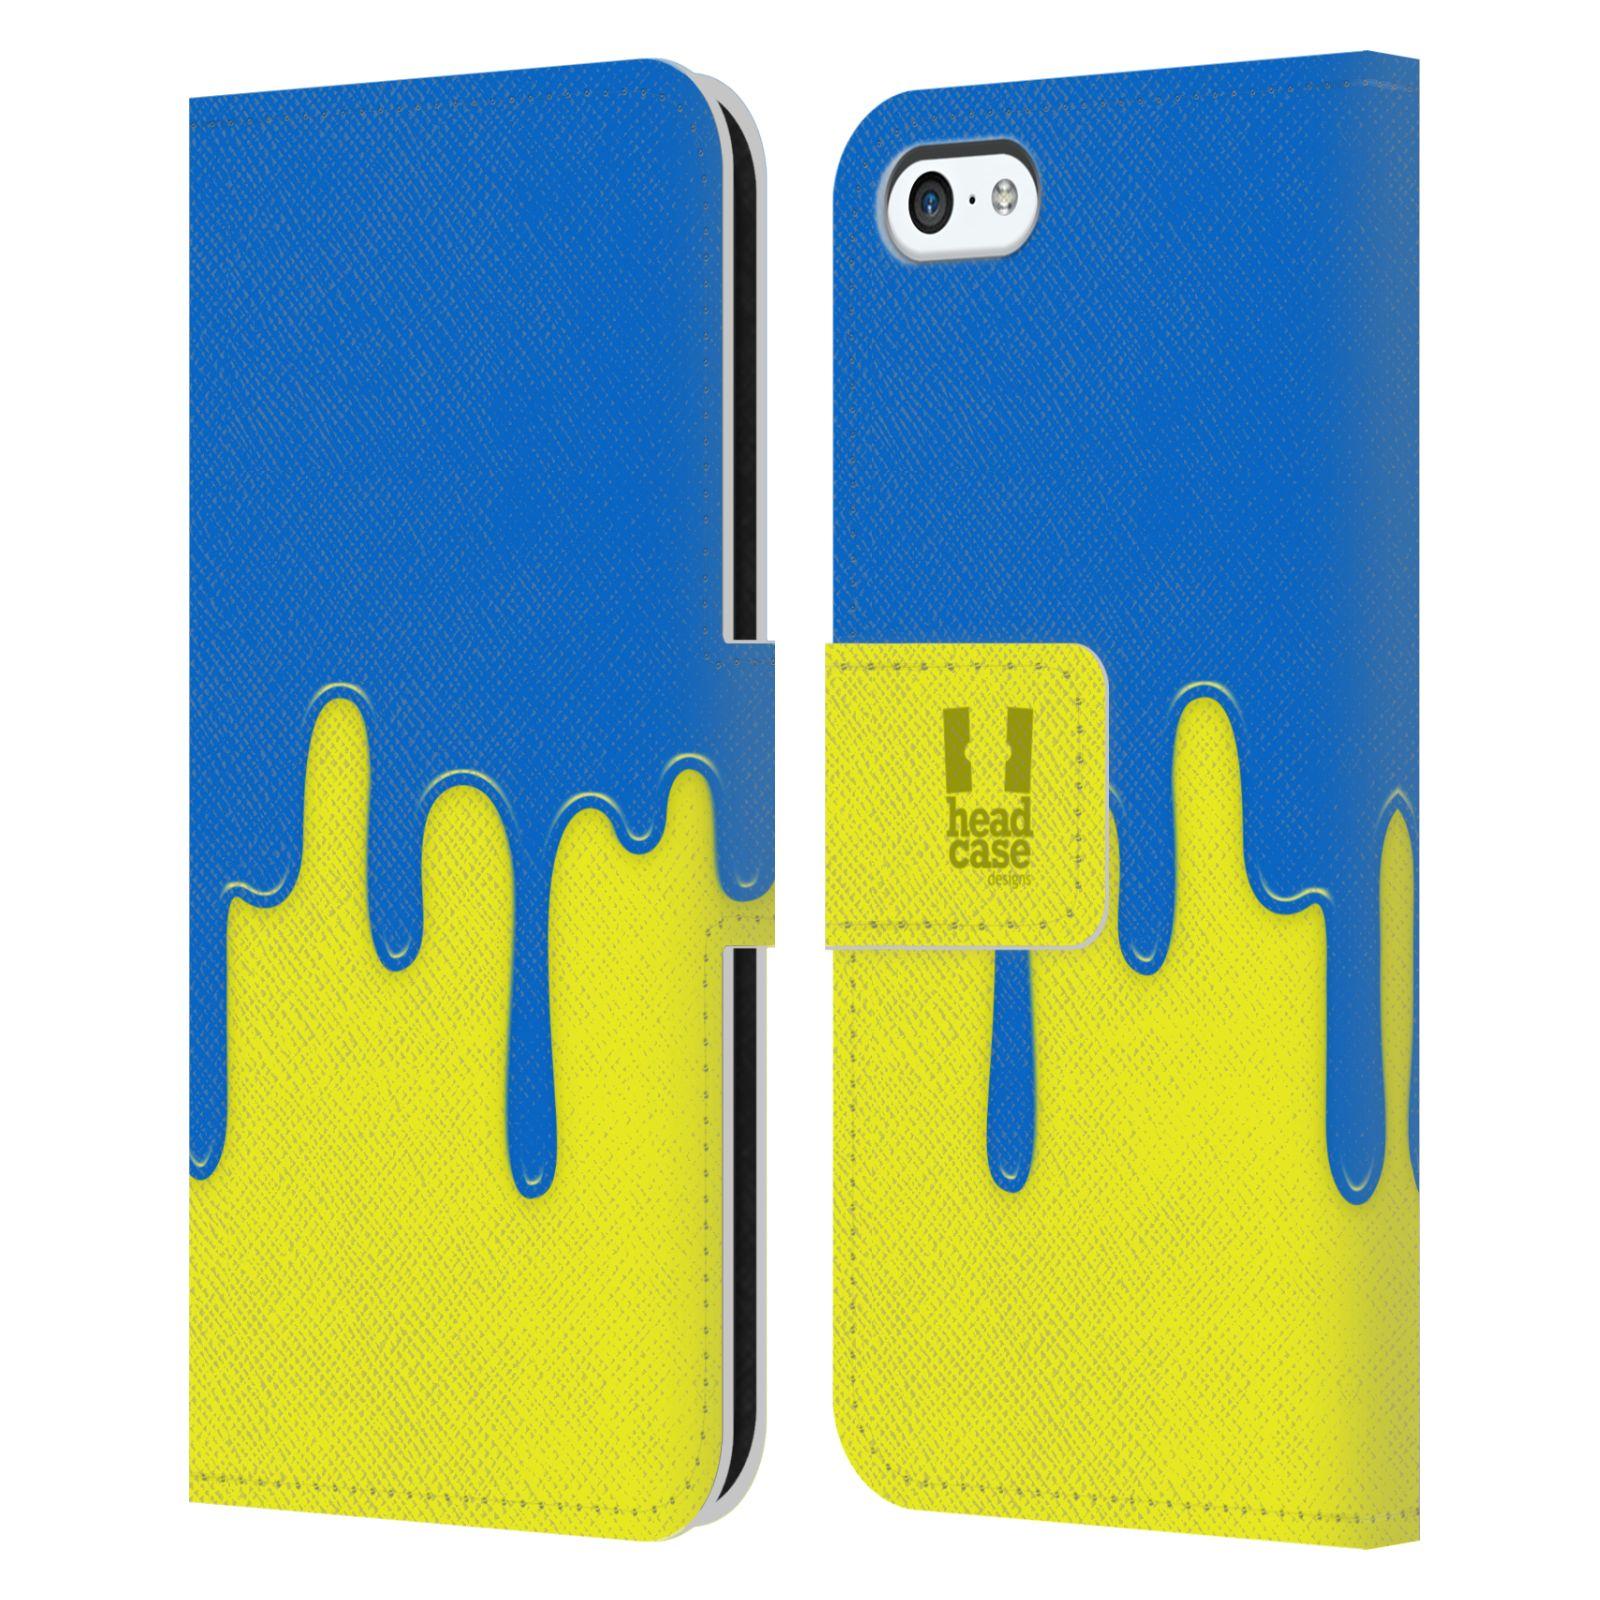 HEAD CASE Flipové pouzdro pro mobil Apple Iphone 5C Rozlitá barva modrá a žlutá